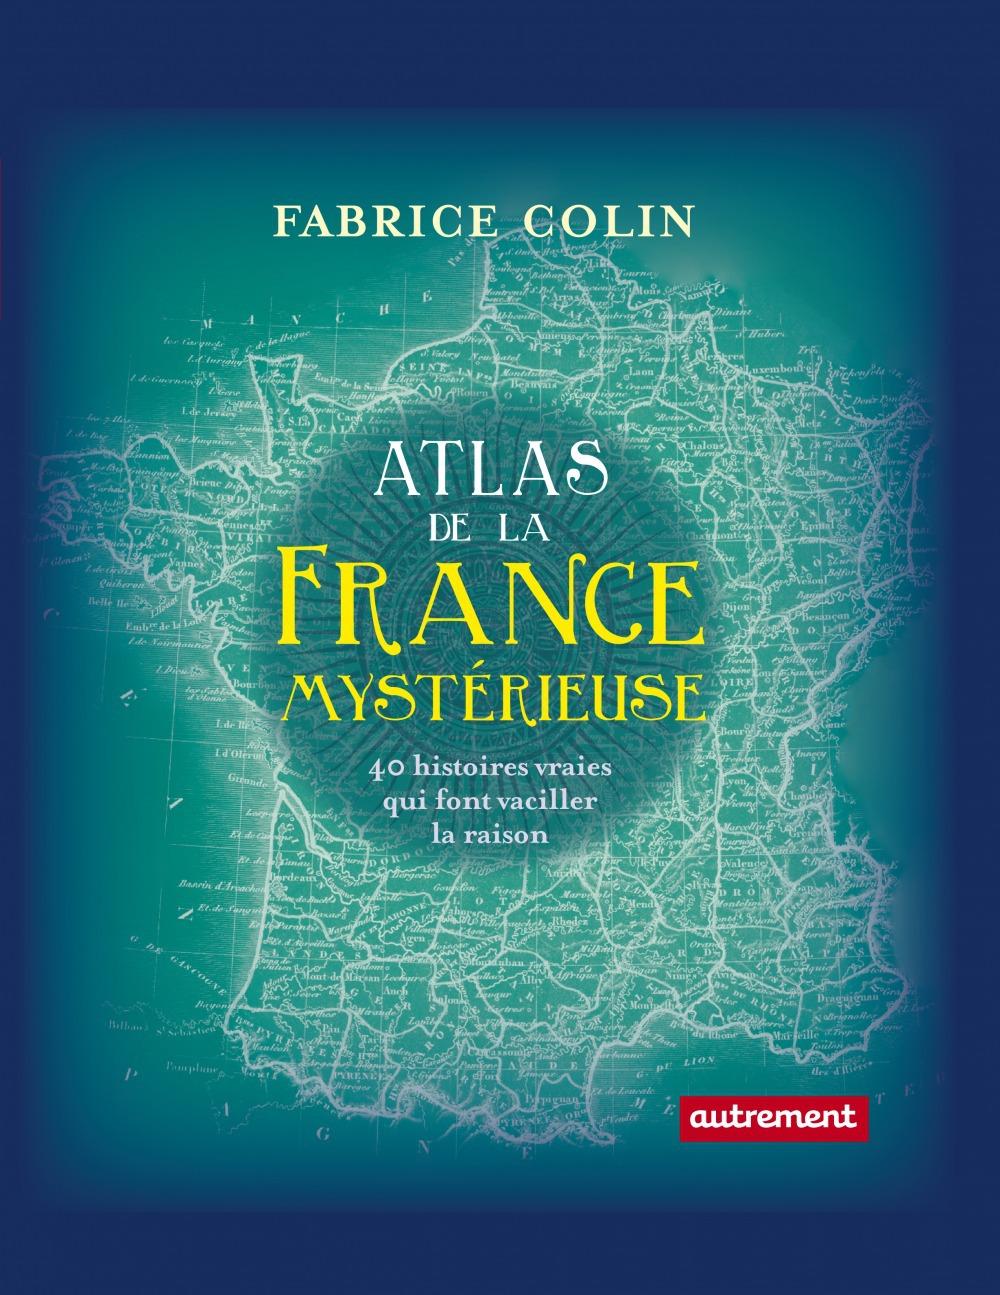 Atlas de la France mysterieuse